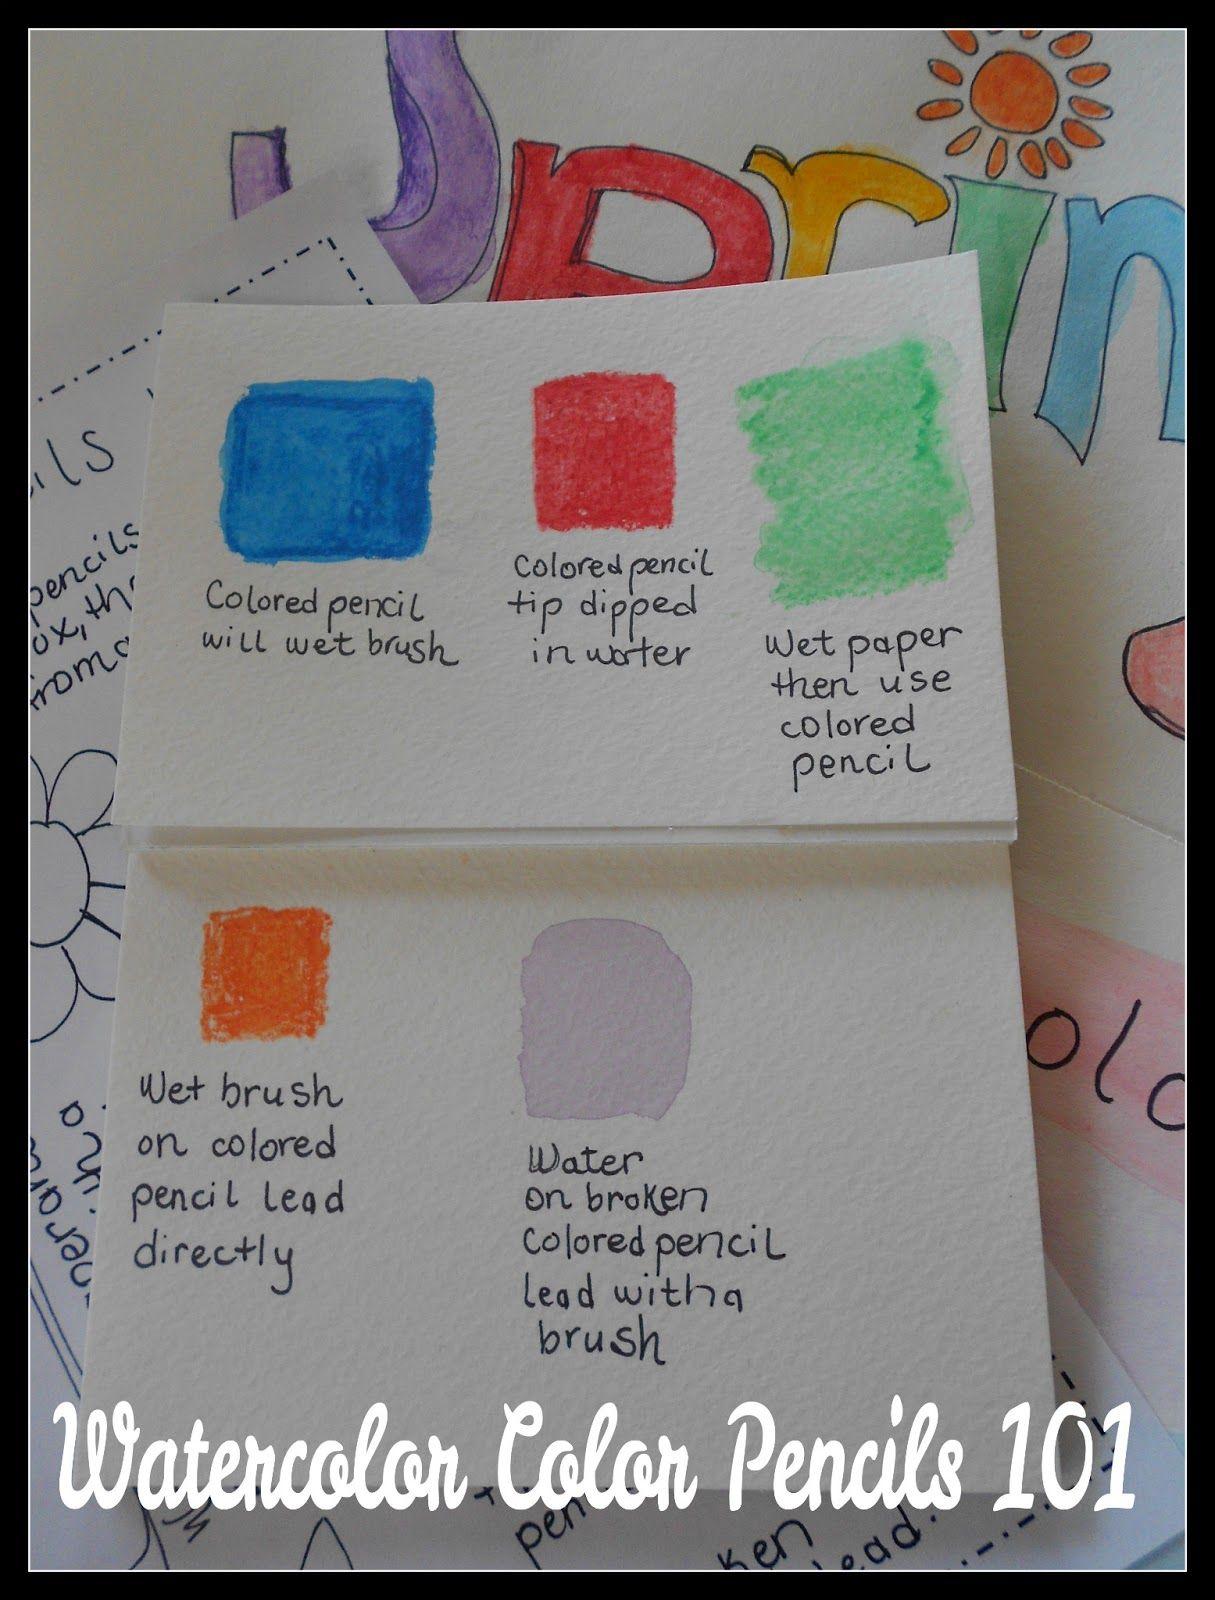 Handbook Of Nature Study Watercolor Pencil 101 Tutorial Video And